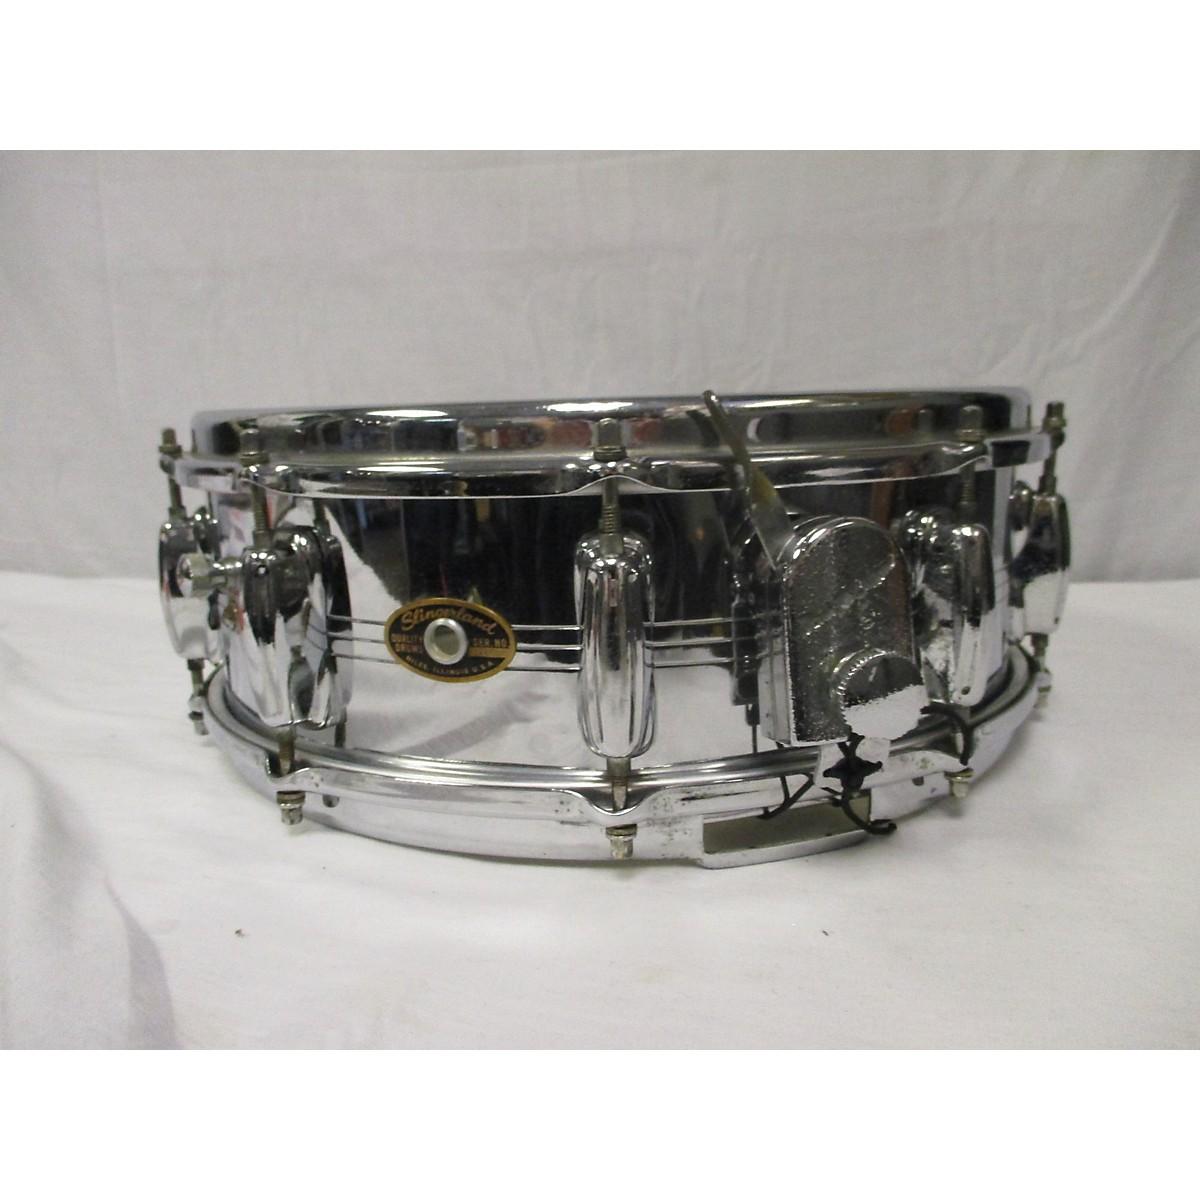 Slingerland 1960s 6.5X14 COB Snare Drum